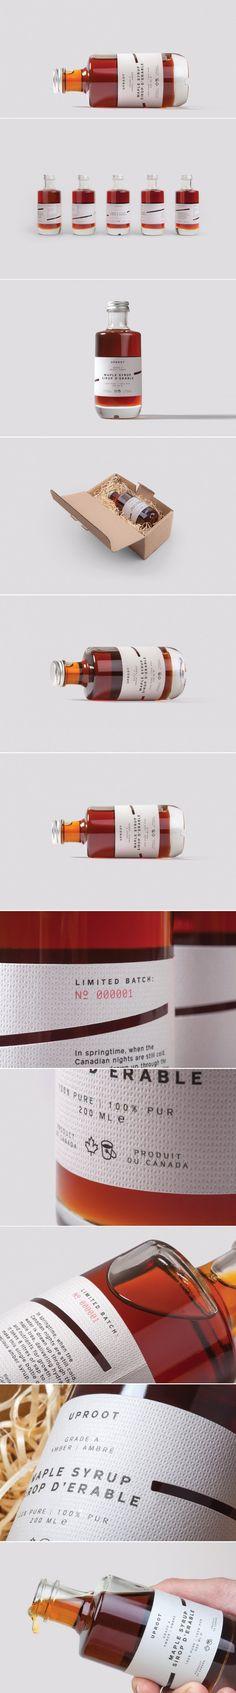 Believe in®️️ creates 'Uproot' to launch new Canadian studio — The Dieline - Branding & Packaging Design